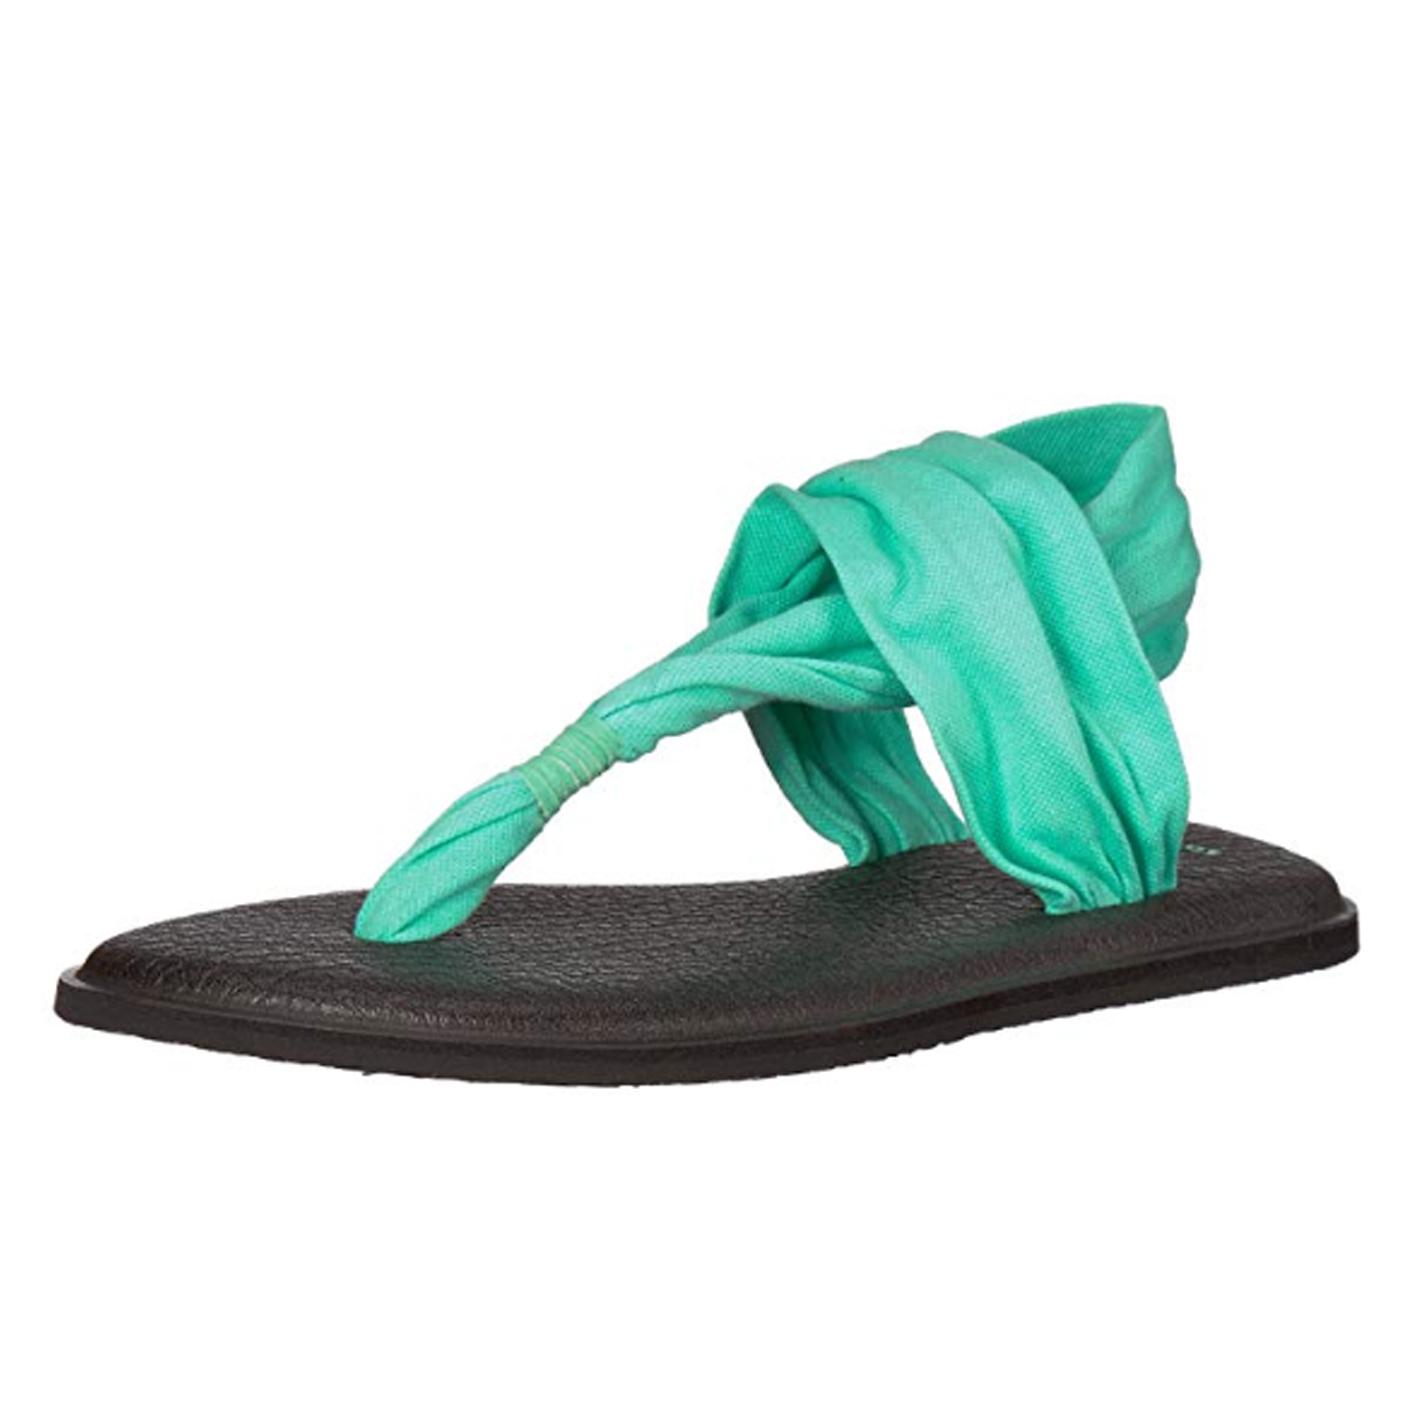 Sanuk Women's Yoga Sling 2 Metallic Flip Flop